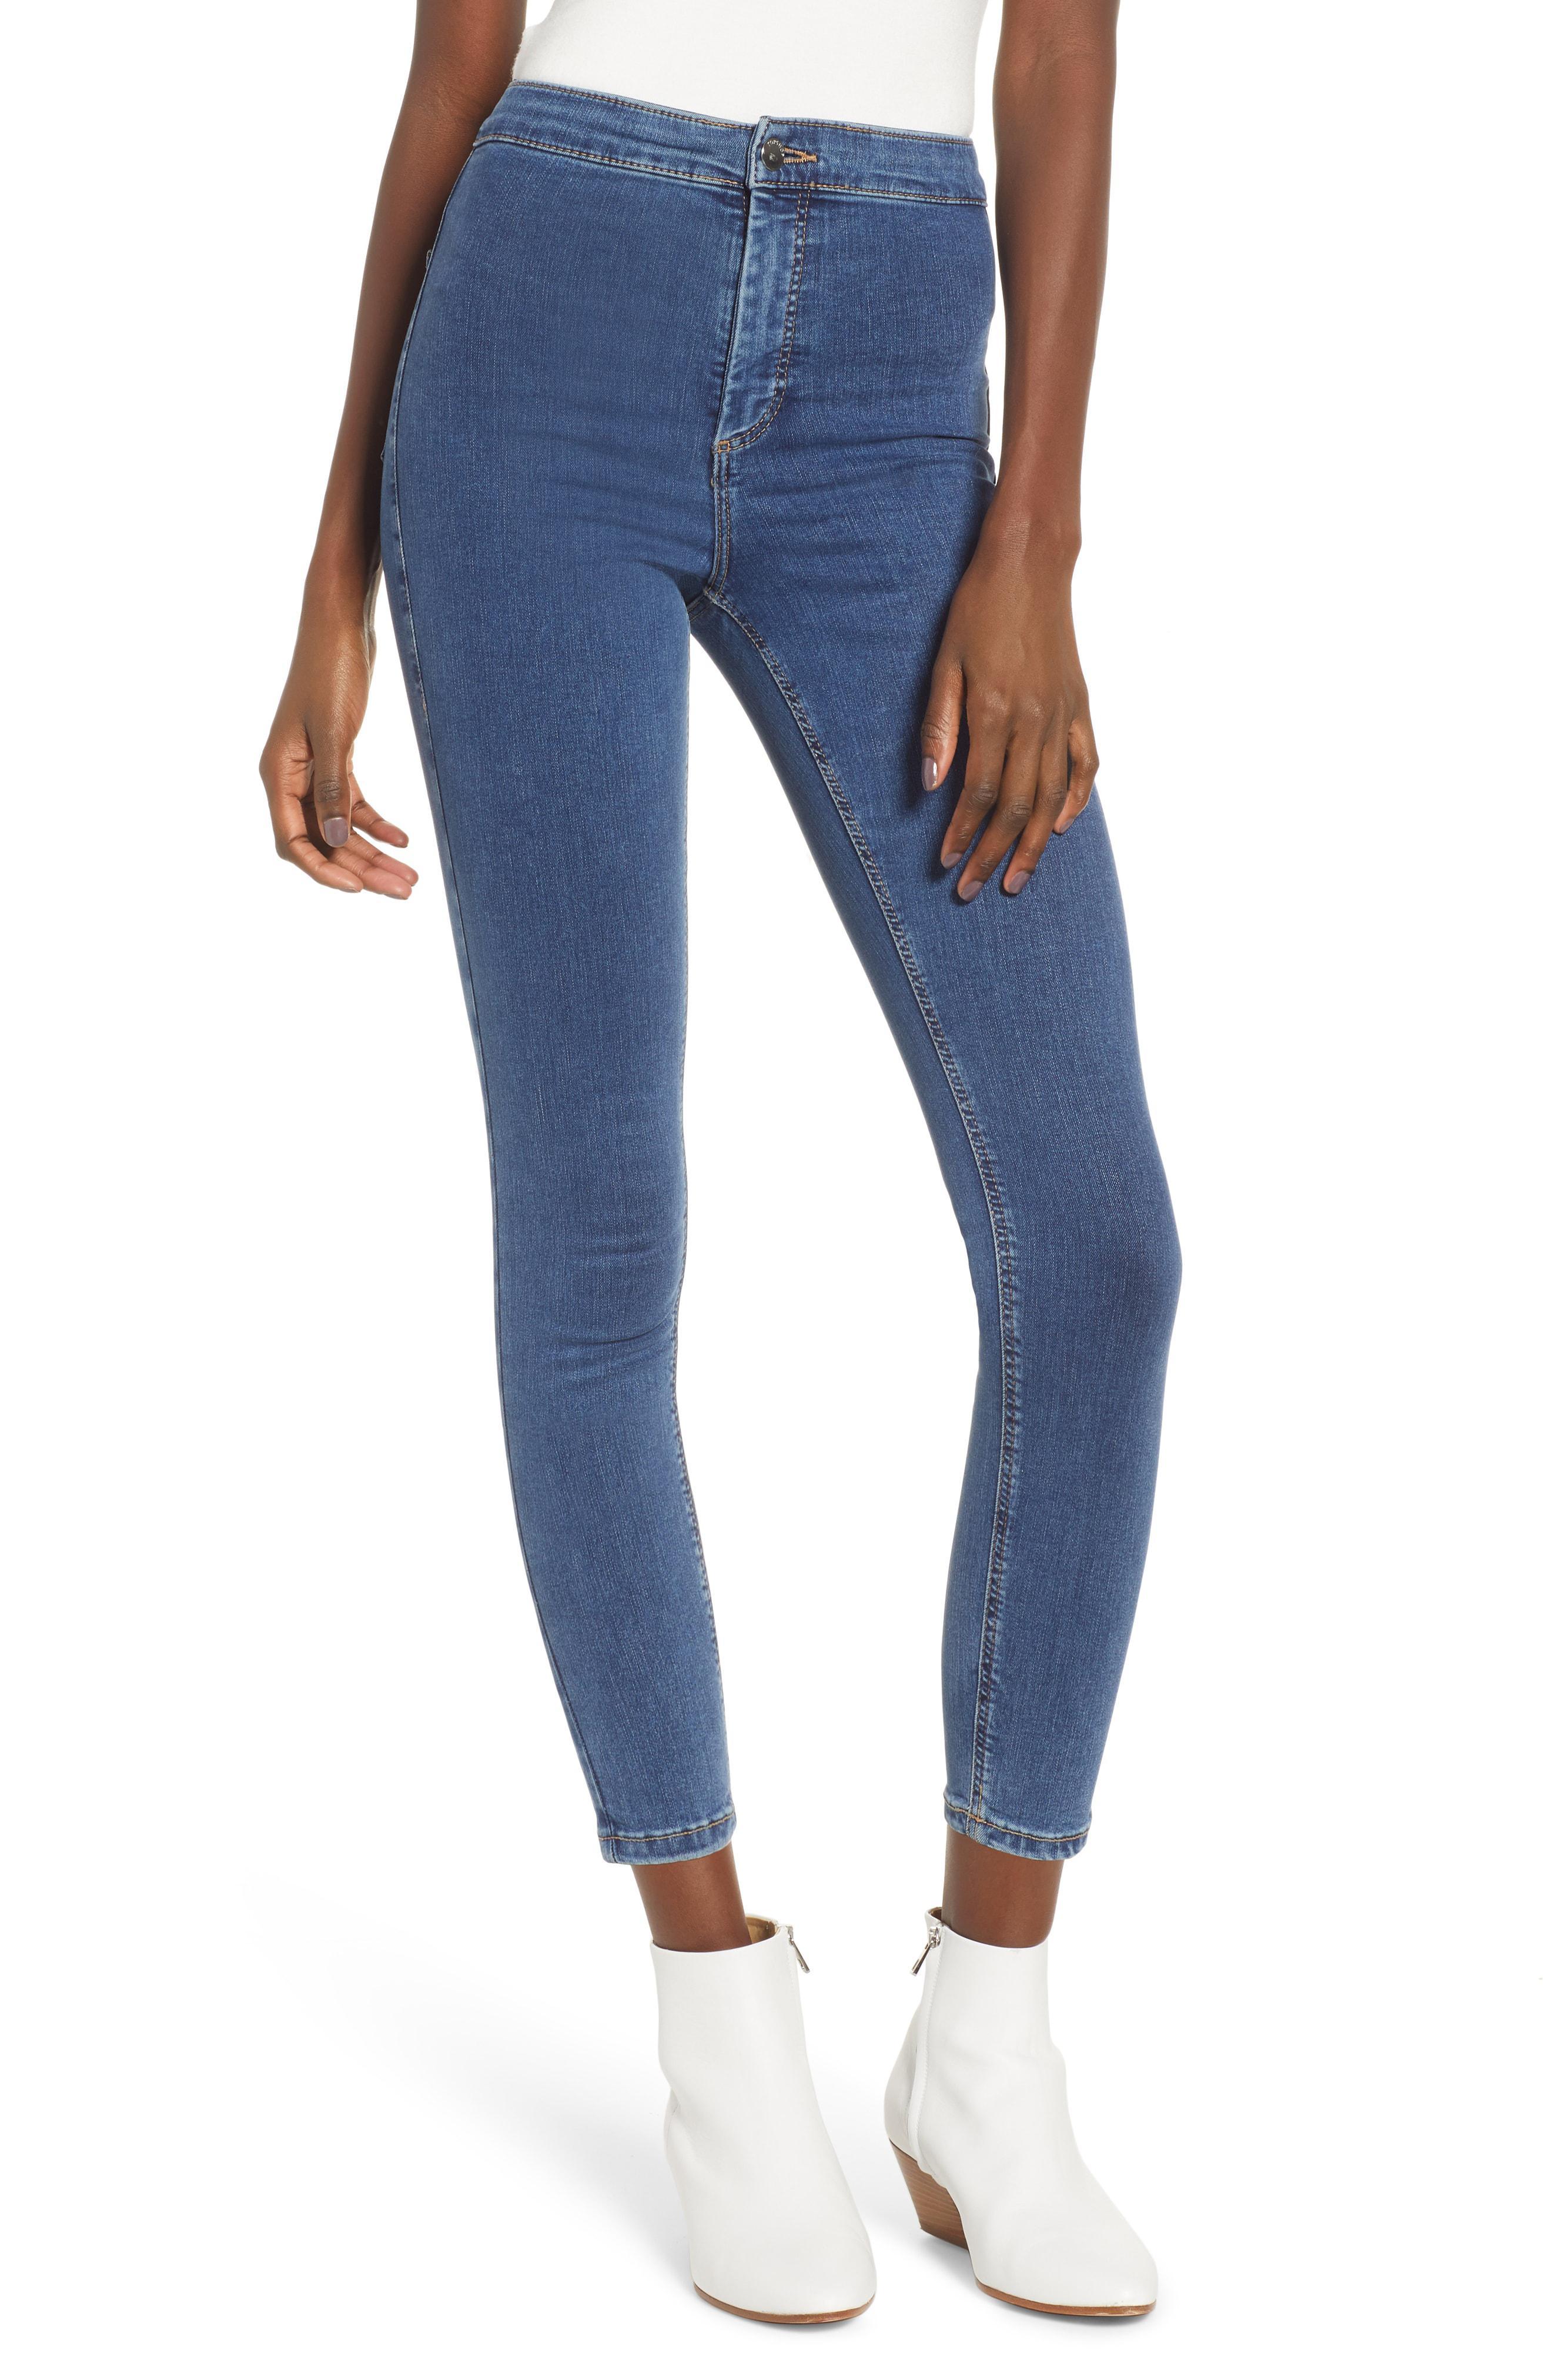 NYDJ Womens Jade Legging Skinny Jeans in Alligator Jacquard